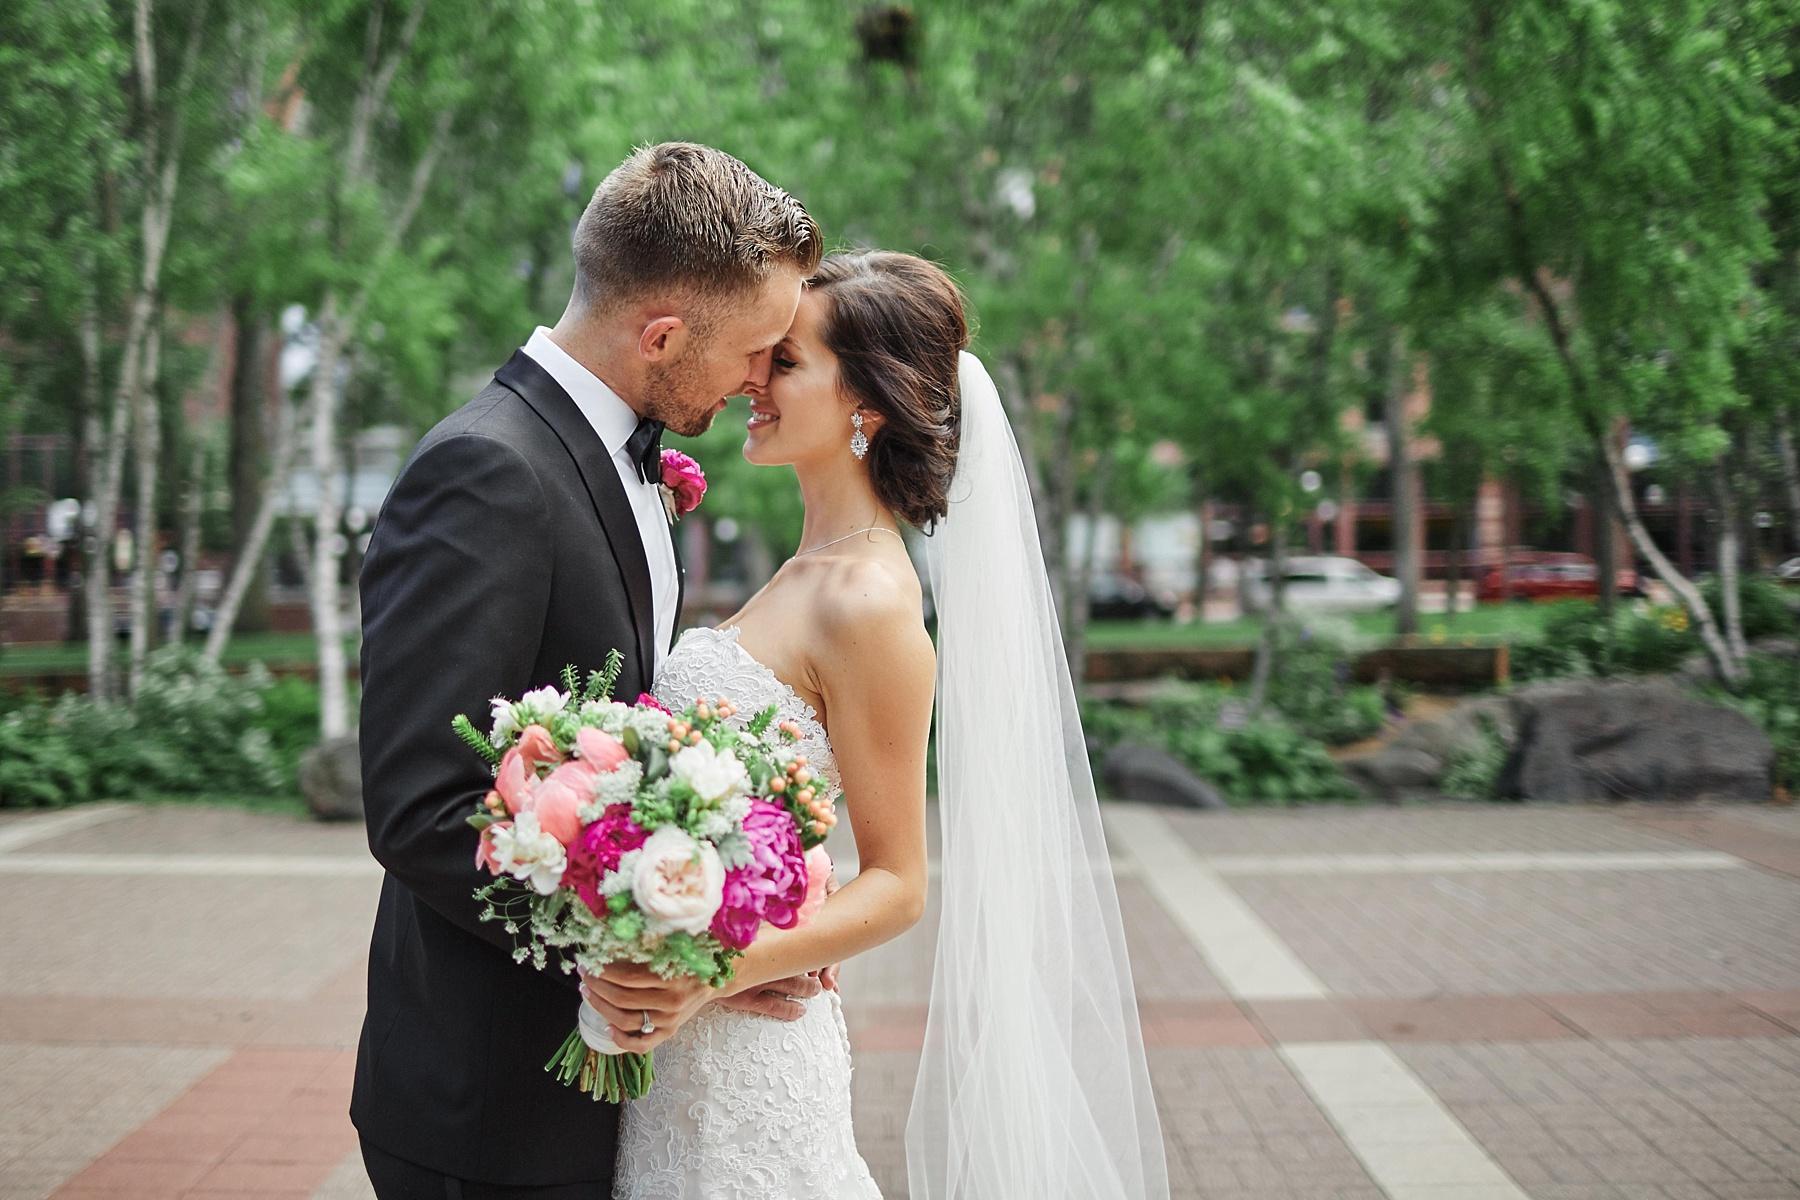 ABULAE-Wedding-Saint-paul-MN-Josh-Sofia-Wedding-Mears-Park_0784.jpg